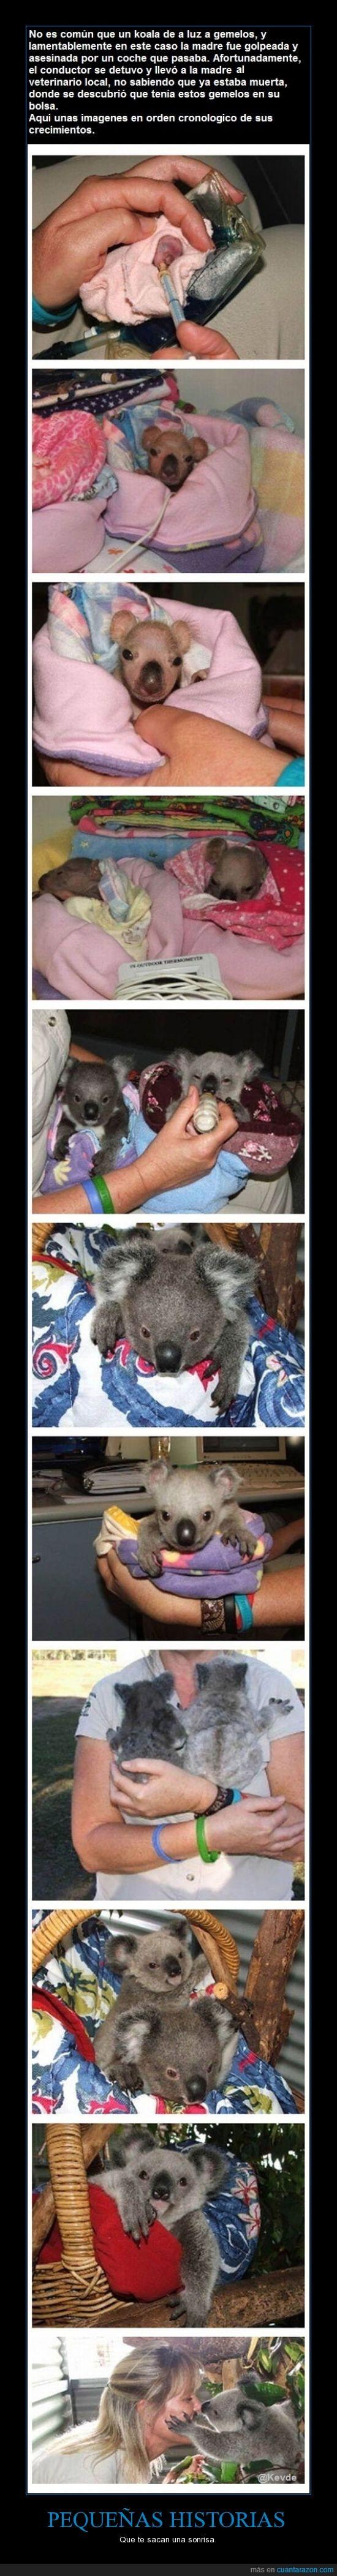 animales,enseñar,gemelos,historia,koala,vida